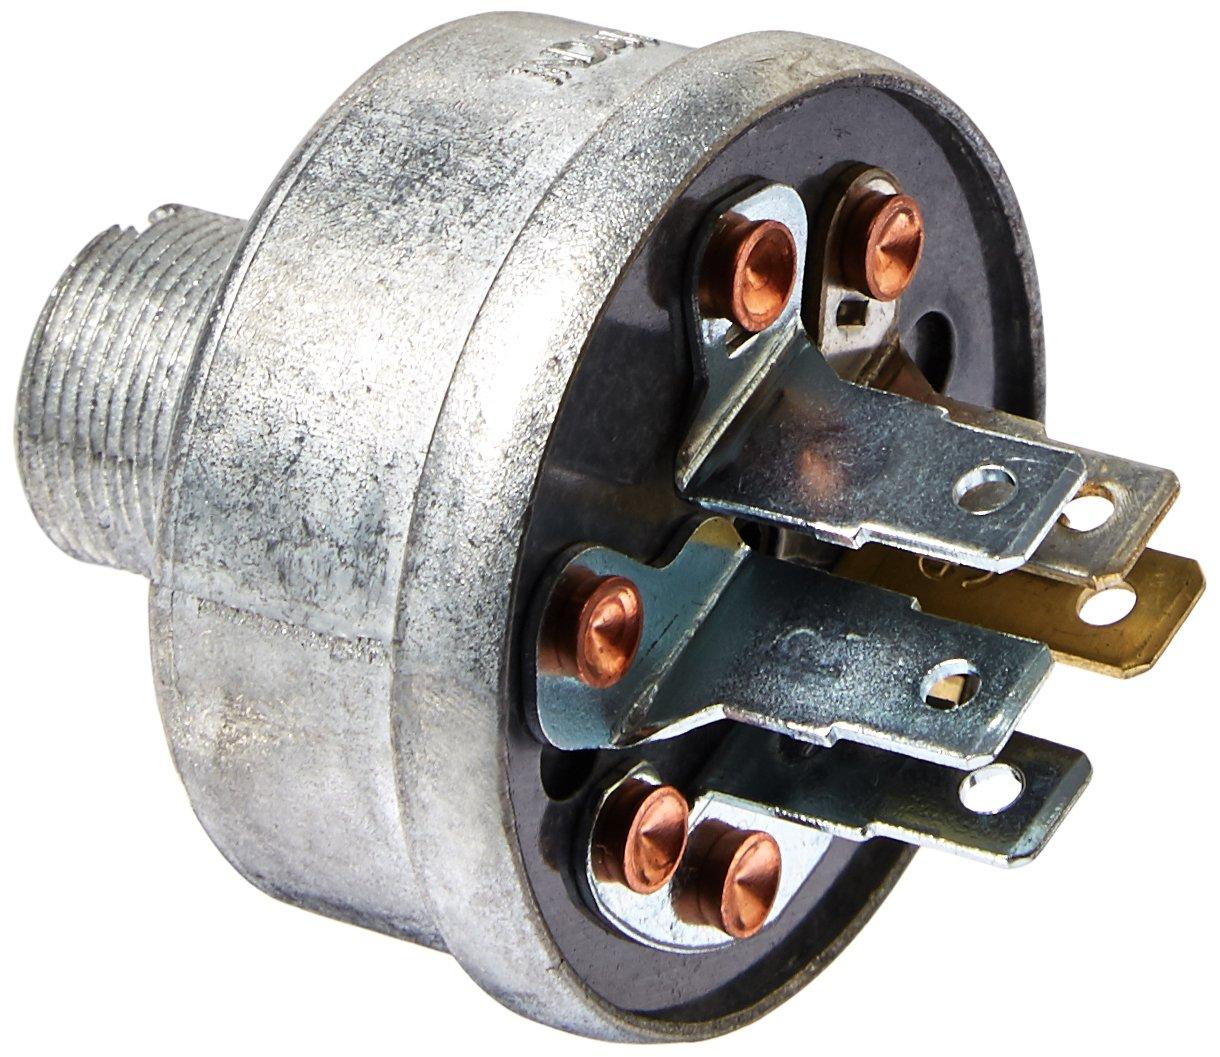 Indak Key Switch Wiring Diagram – Indak Key Switch Wiring Diagram